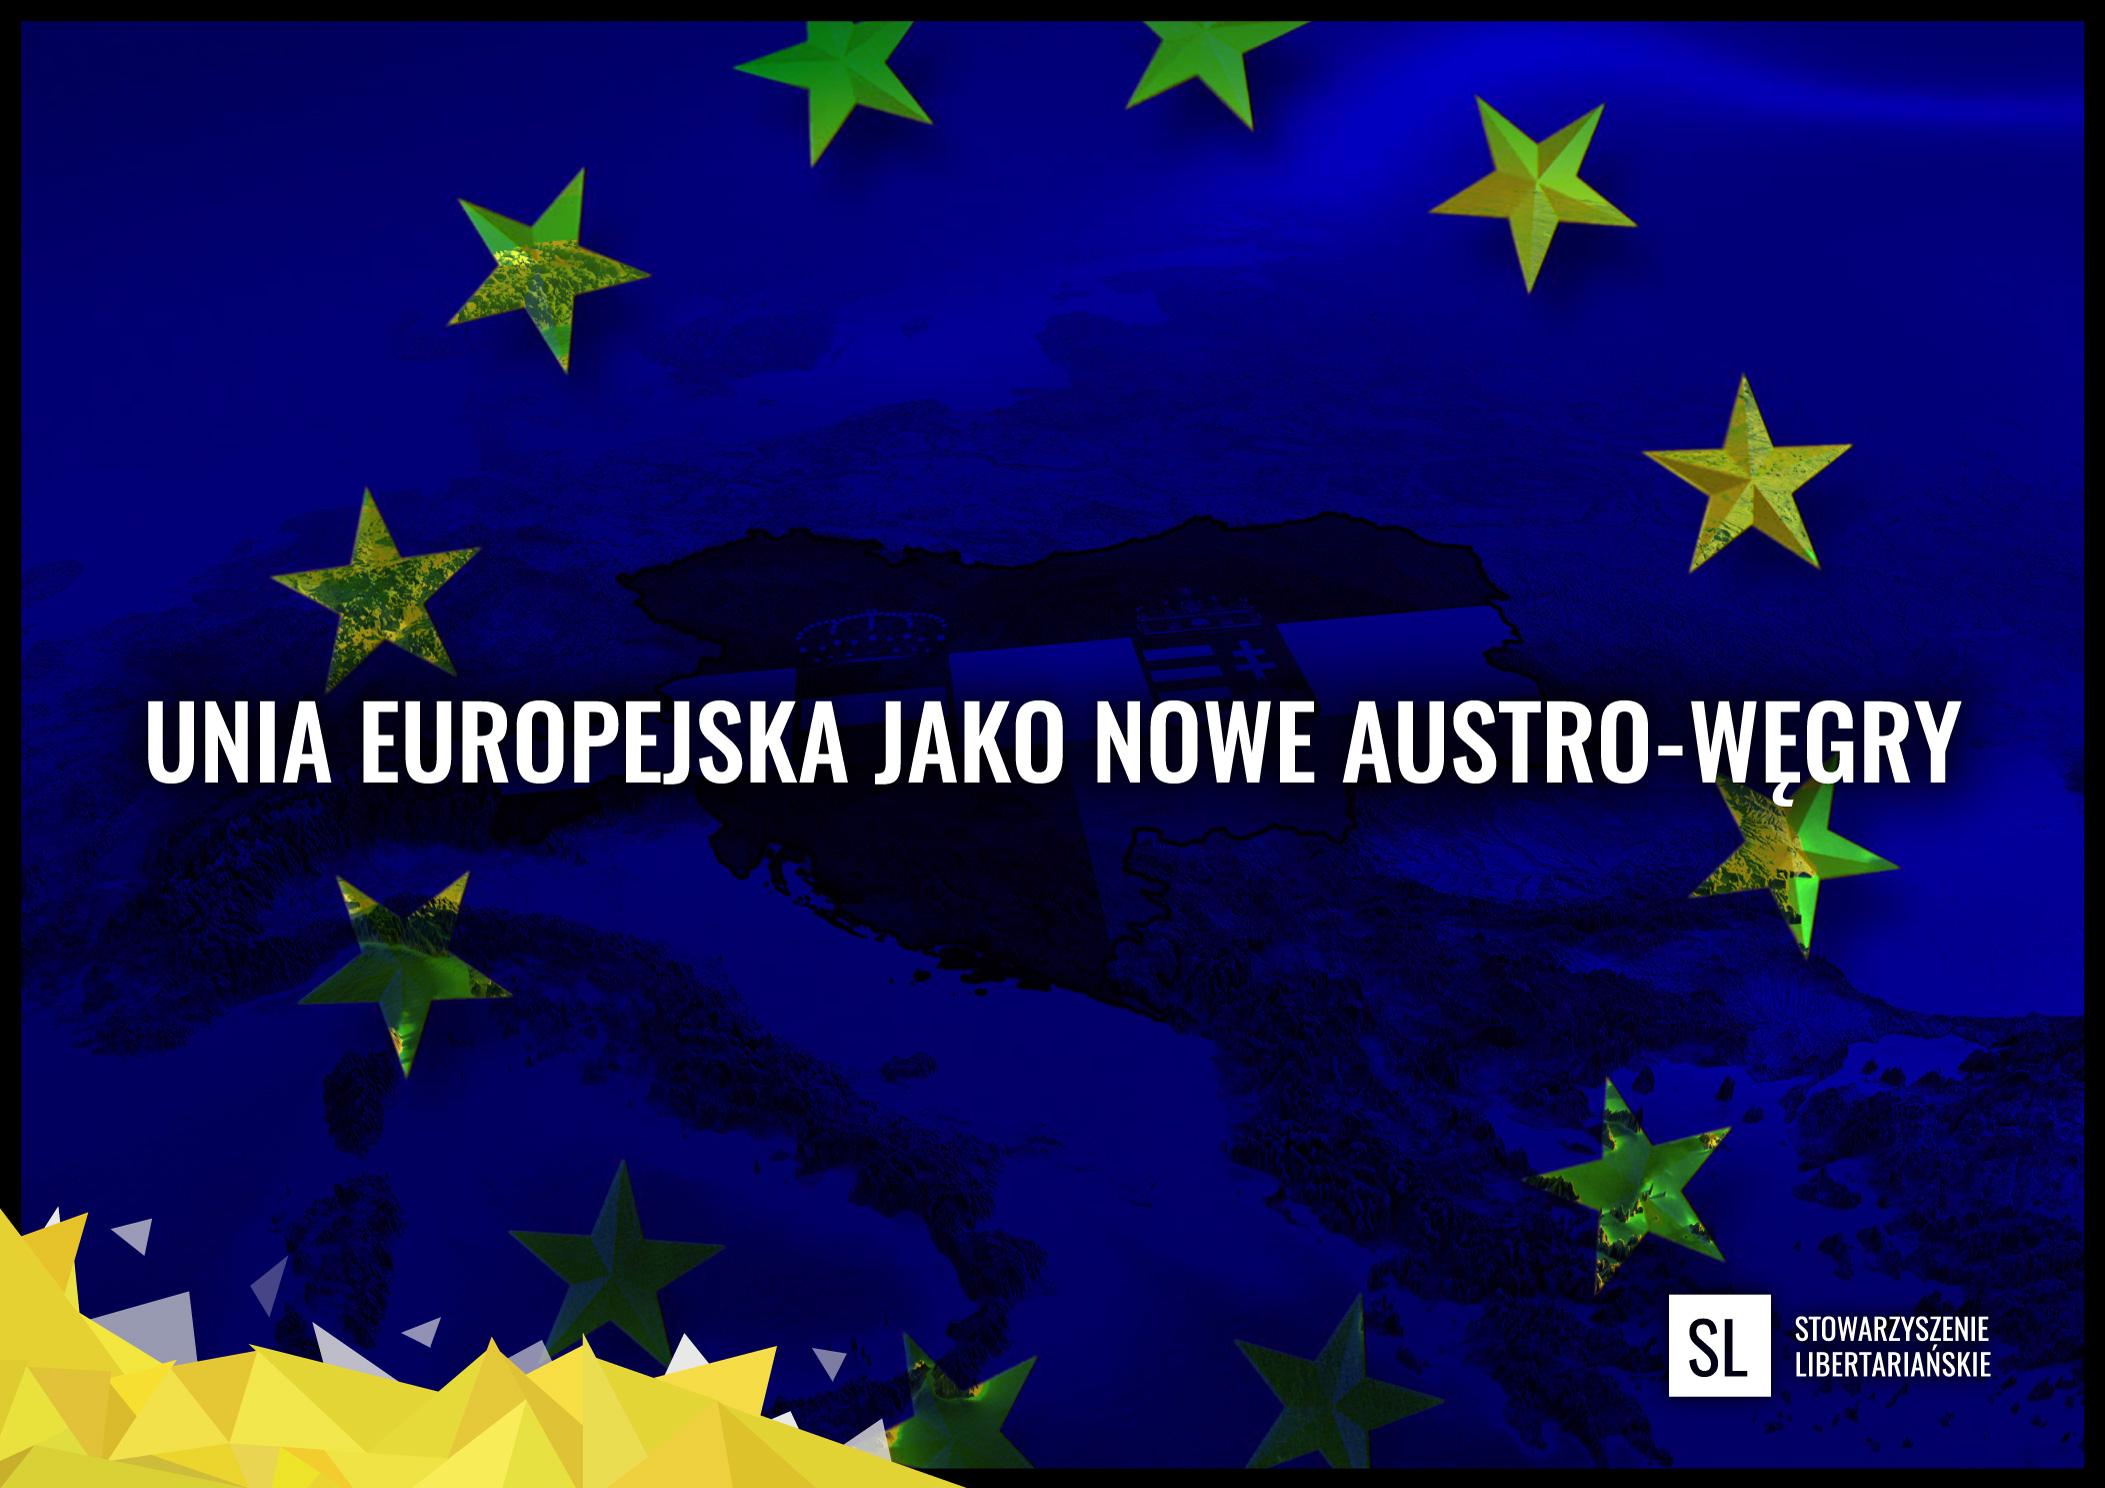 slib.pl